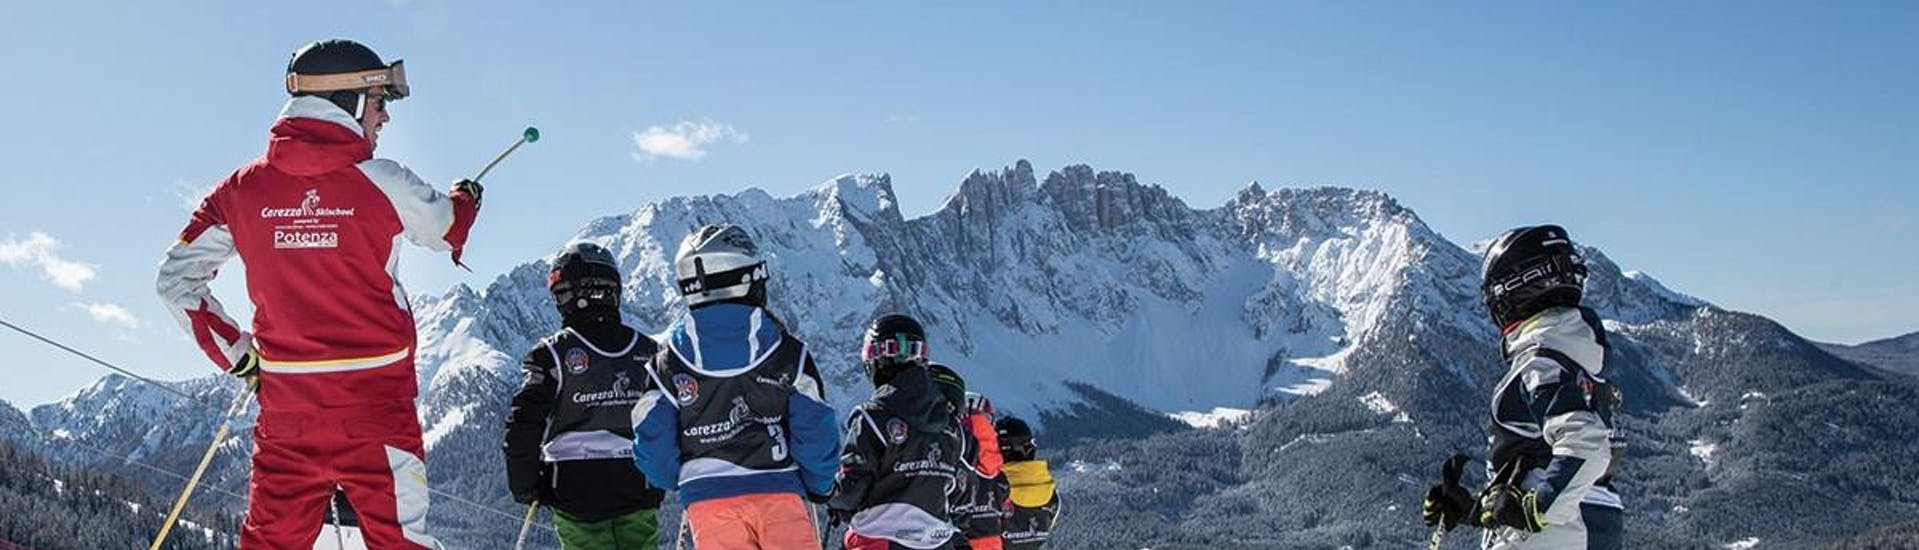 Kids Ski Lessons (from 4 years) - Advanced met Carezza Skischool - Hero image